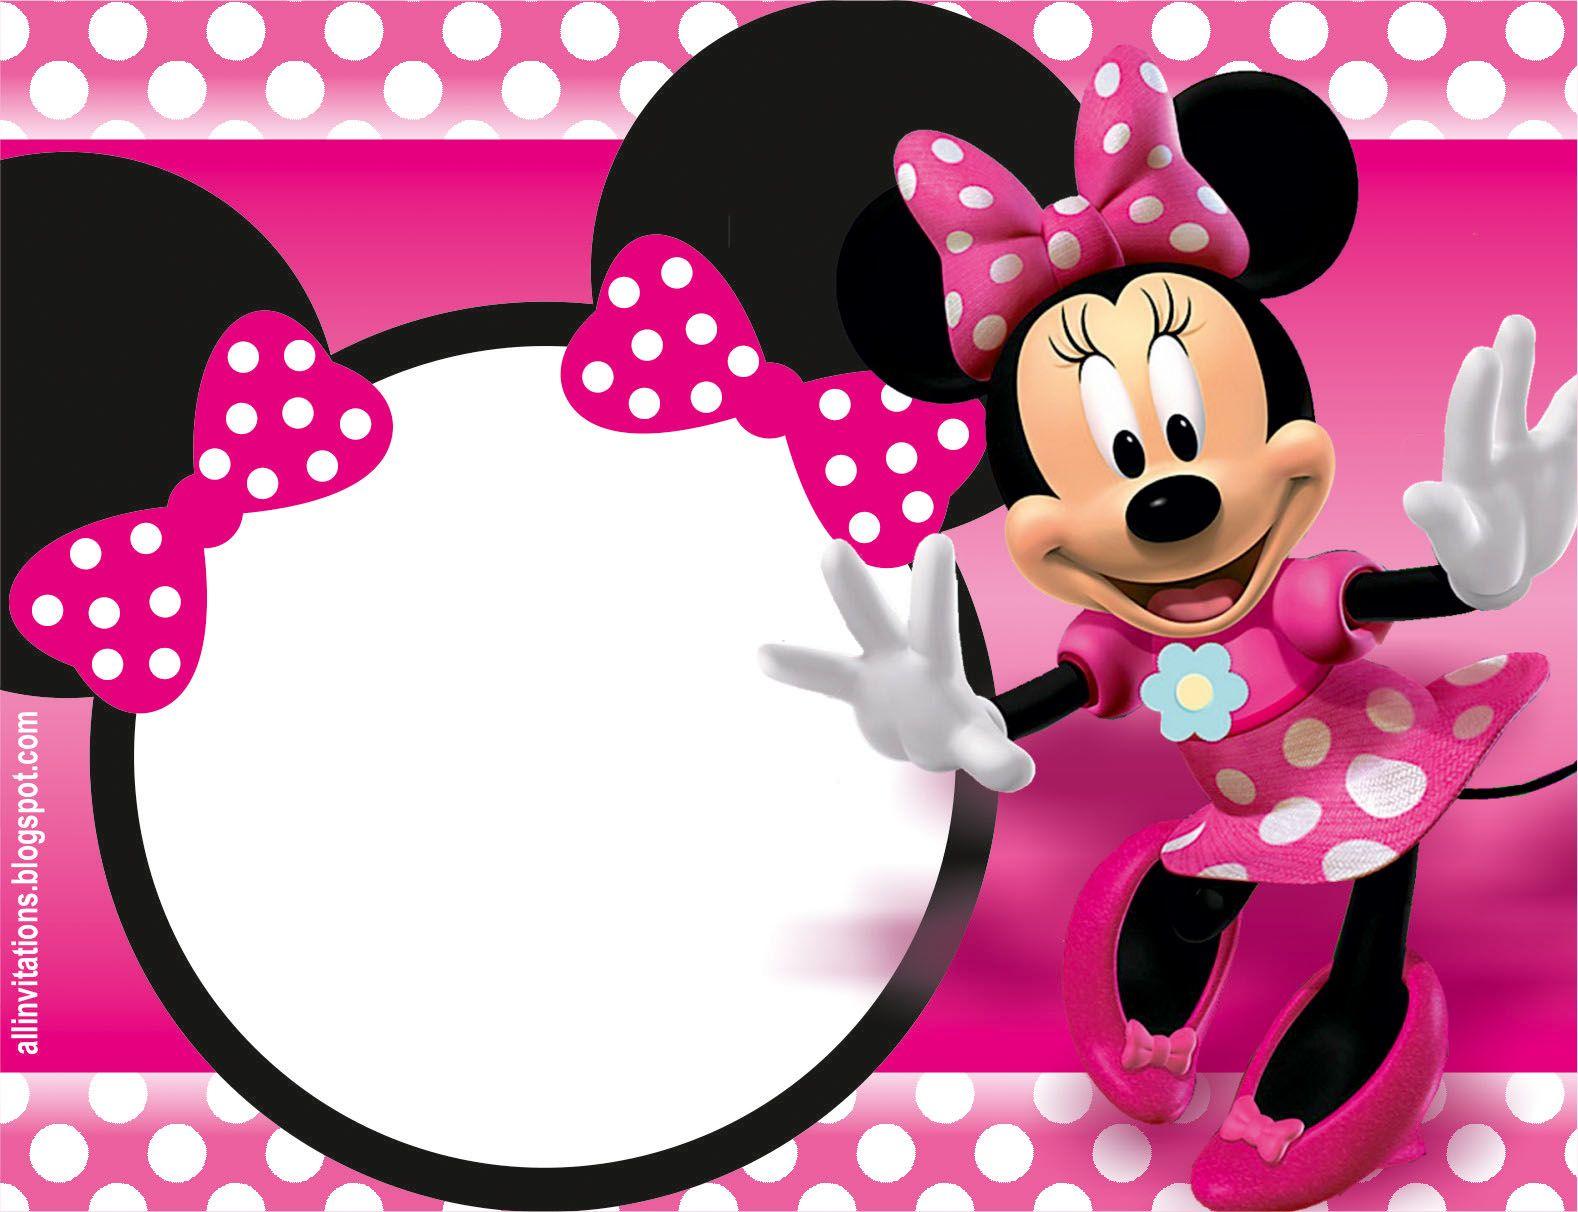 Pin by Anastacia Molina on minnie | Pinterest | Minnie mouse ...